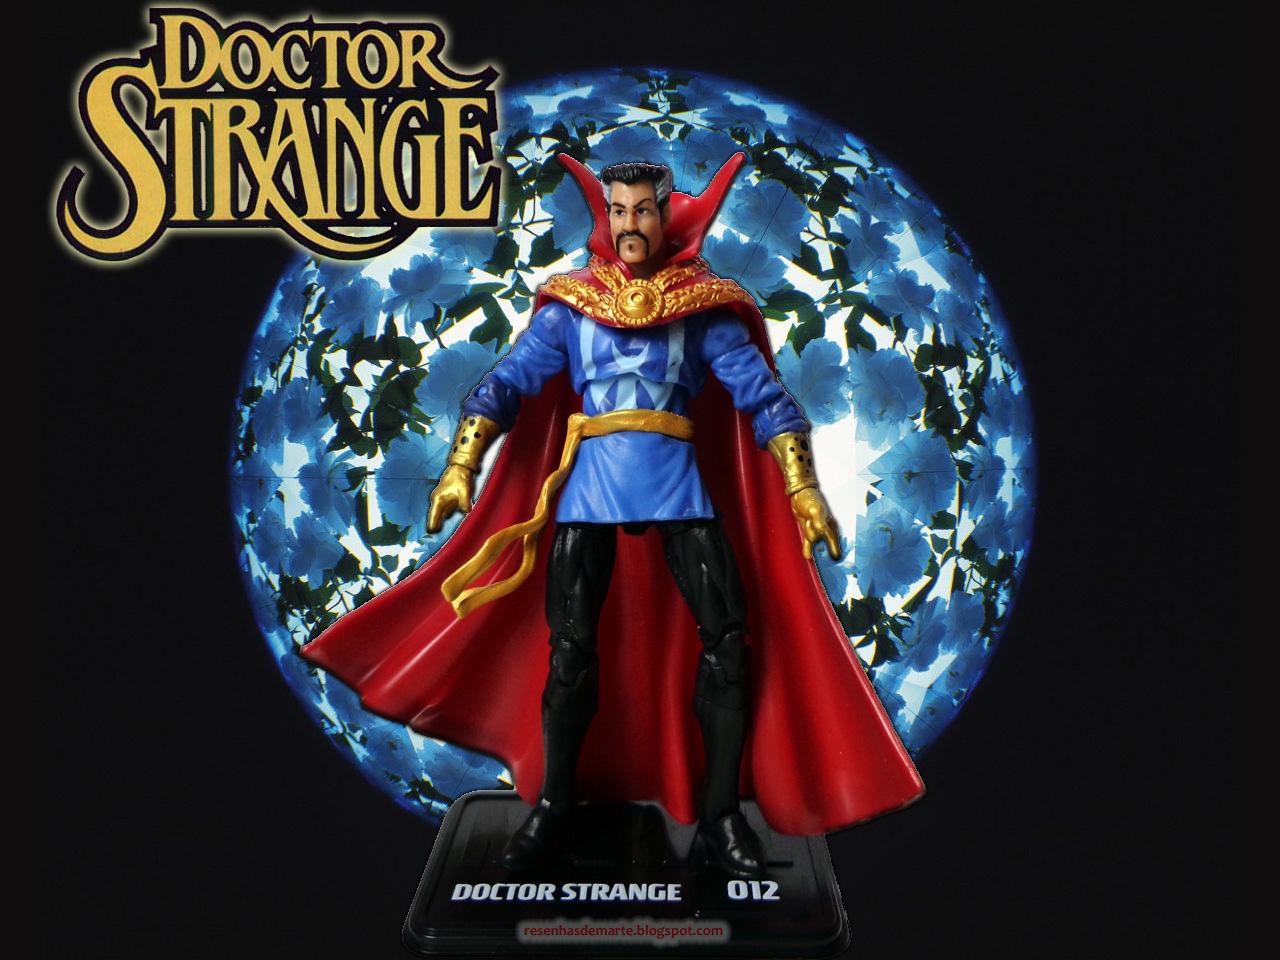 http://2.bp.blogspot.com/-6AbnDluvy7s/UNOUVzevyLI/AAAAAAAAKhc/ln_jN_px0fo/s1600/Marvel+Universe+Doctor+Strange+Wallpaper+1280+x+960.jpg